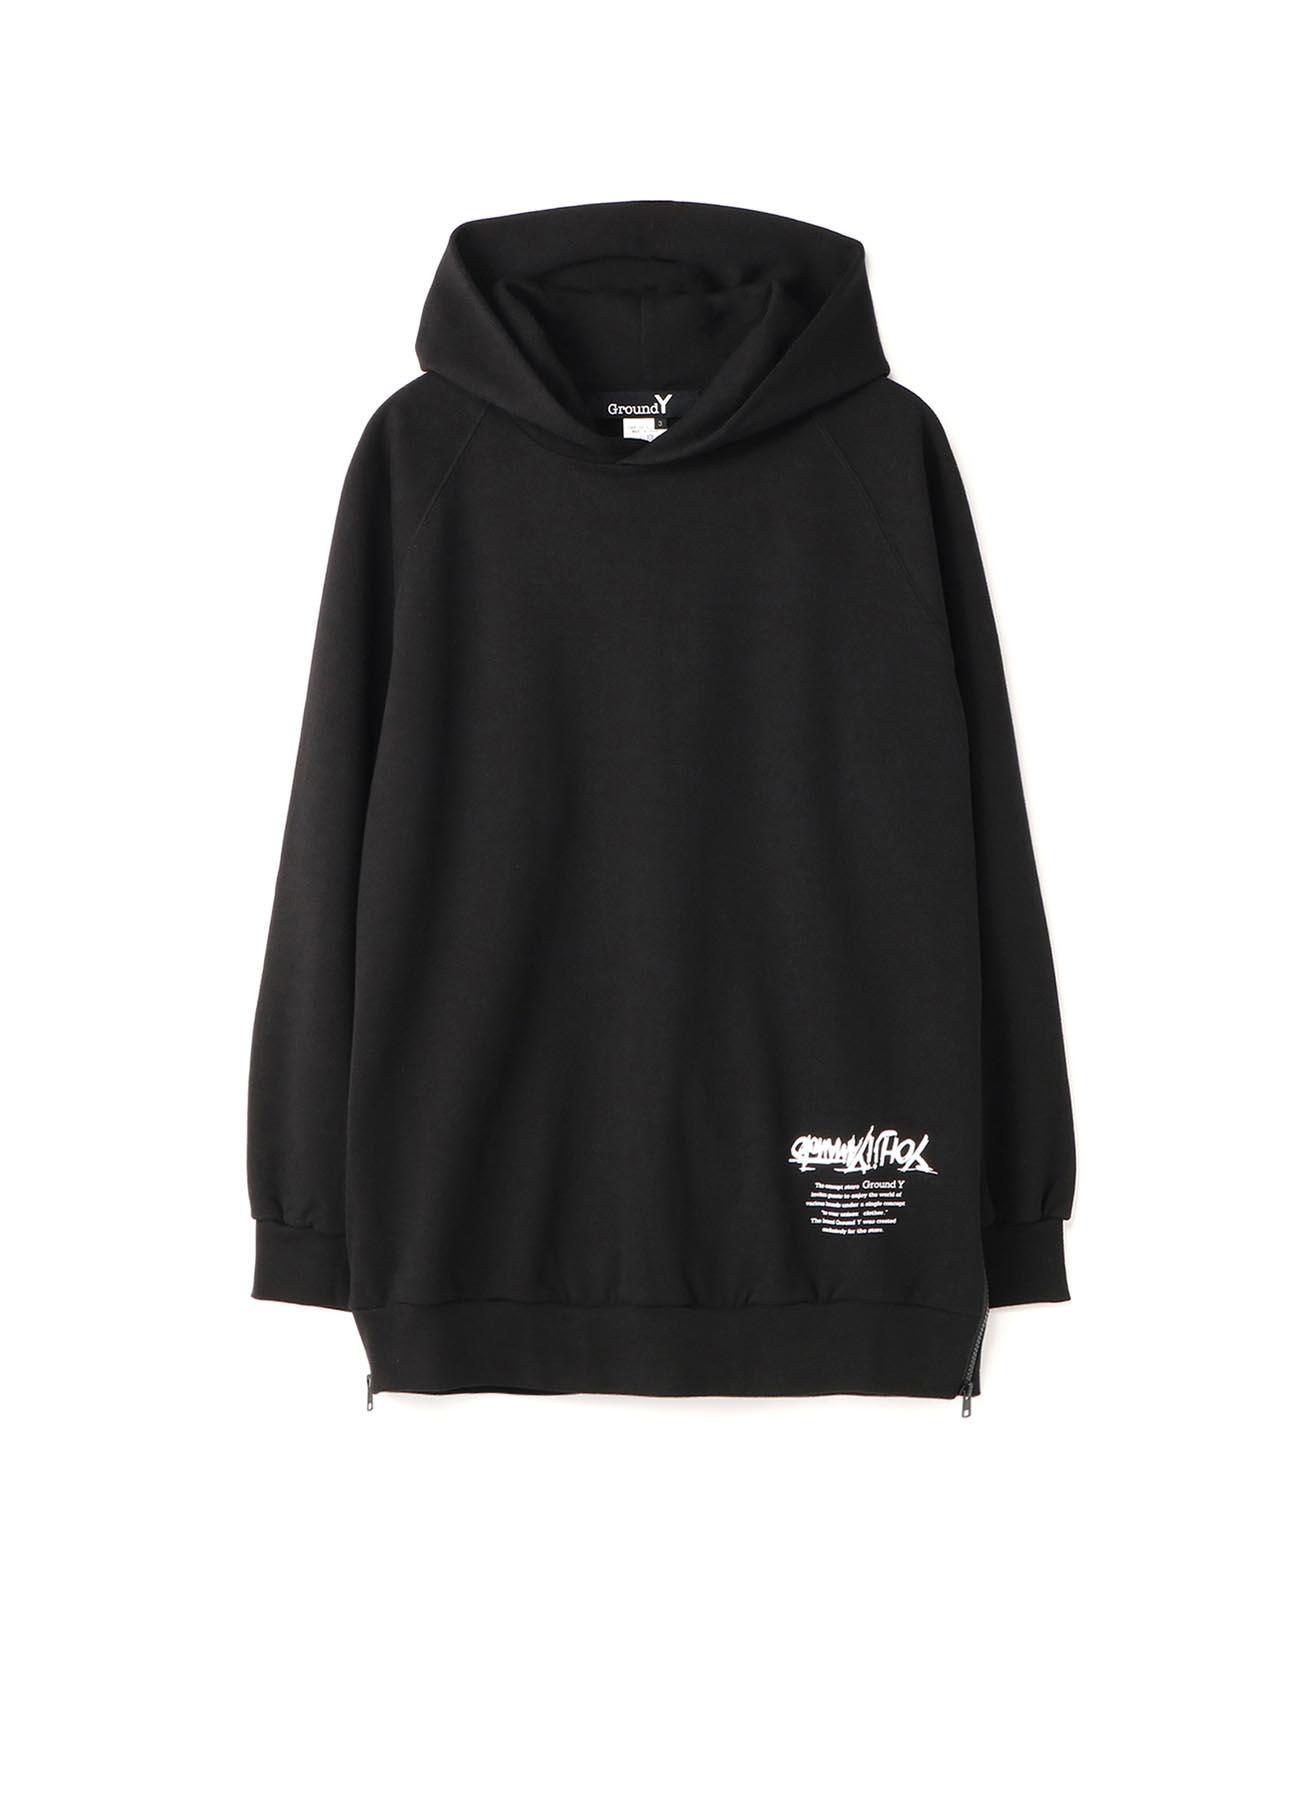 Yohji Yamamoto Upside Down LOGO Side Zipper Hoodie